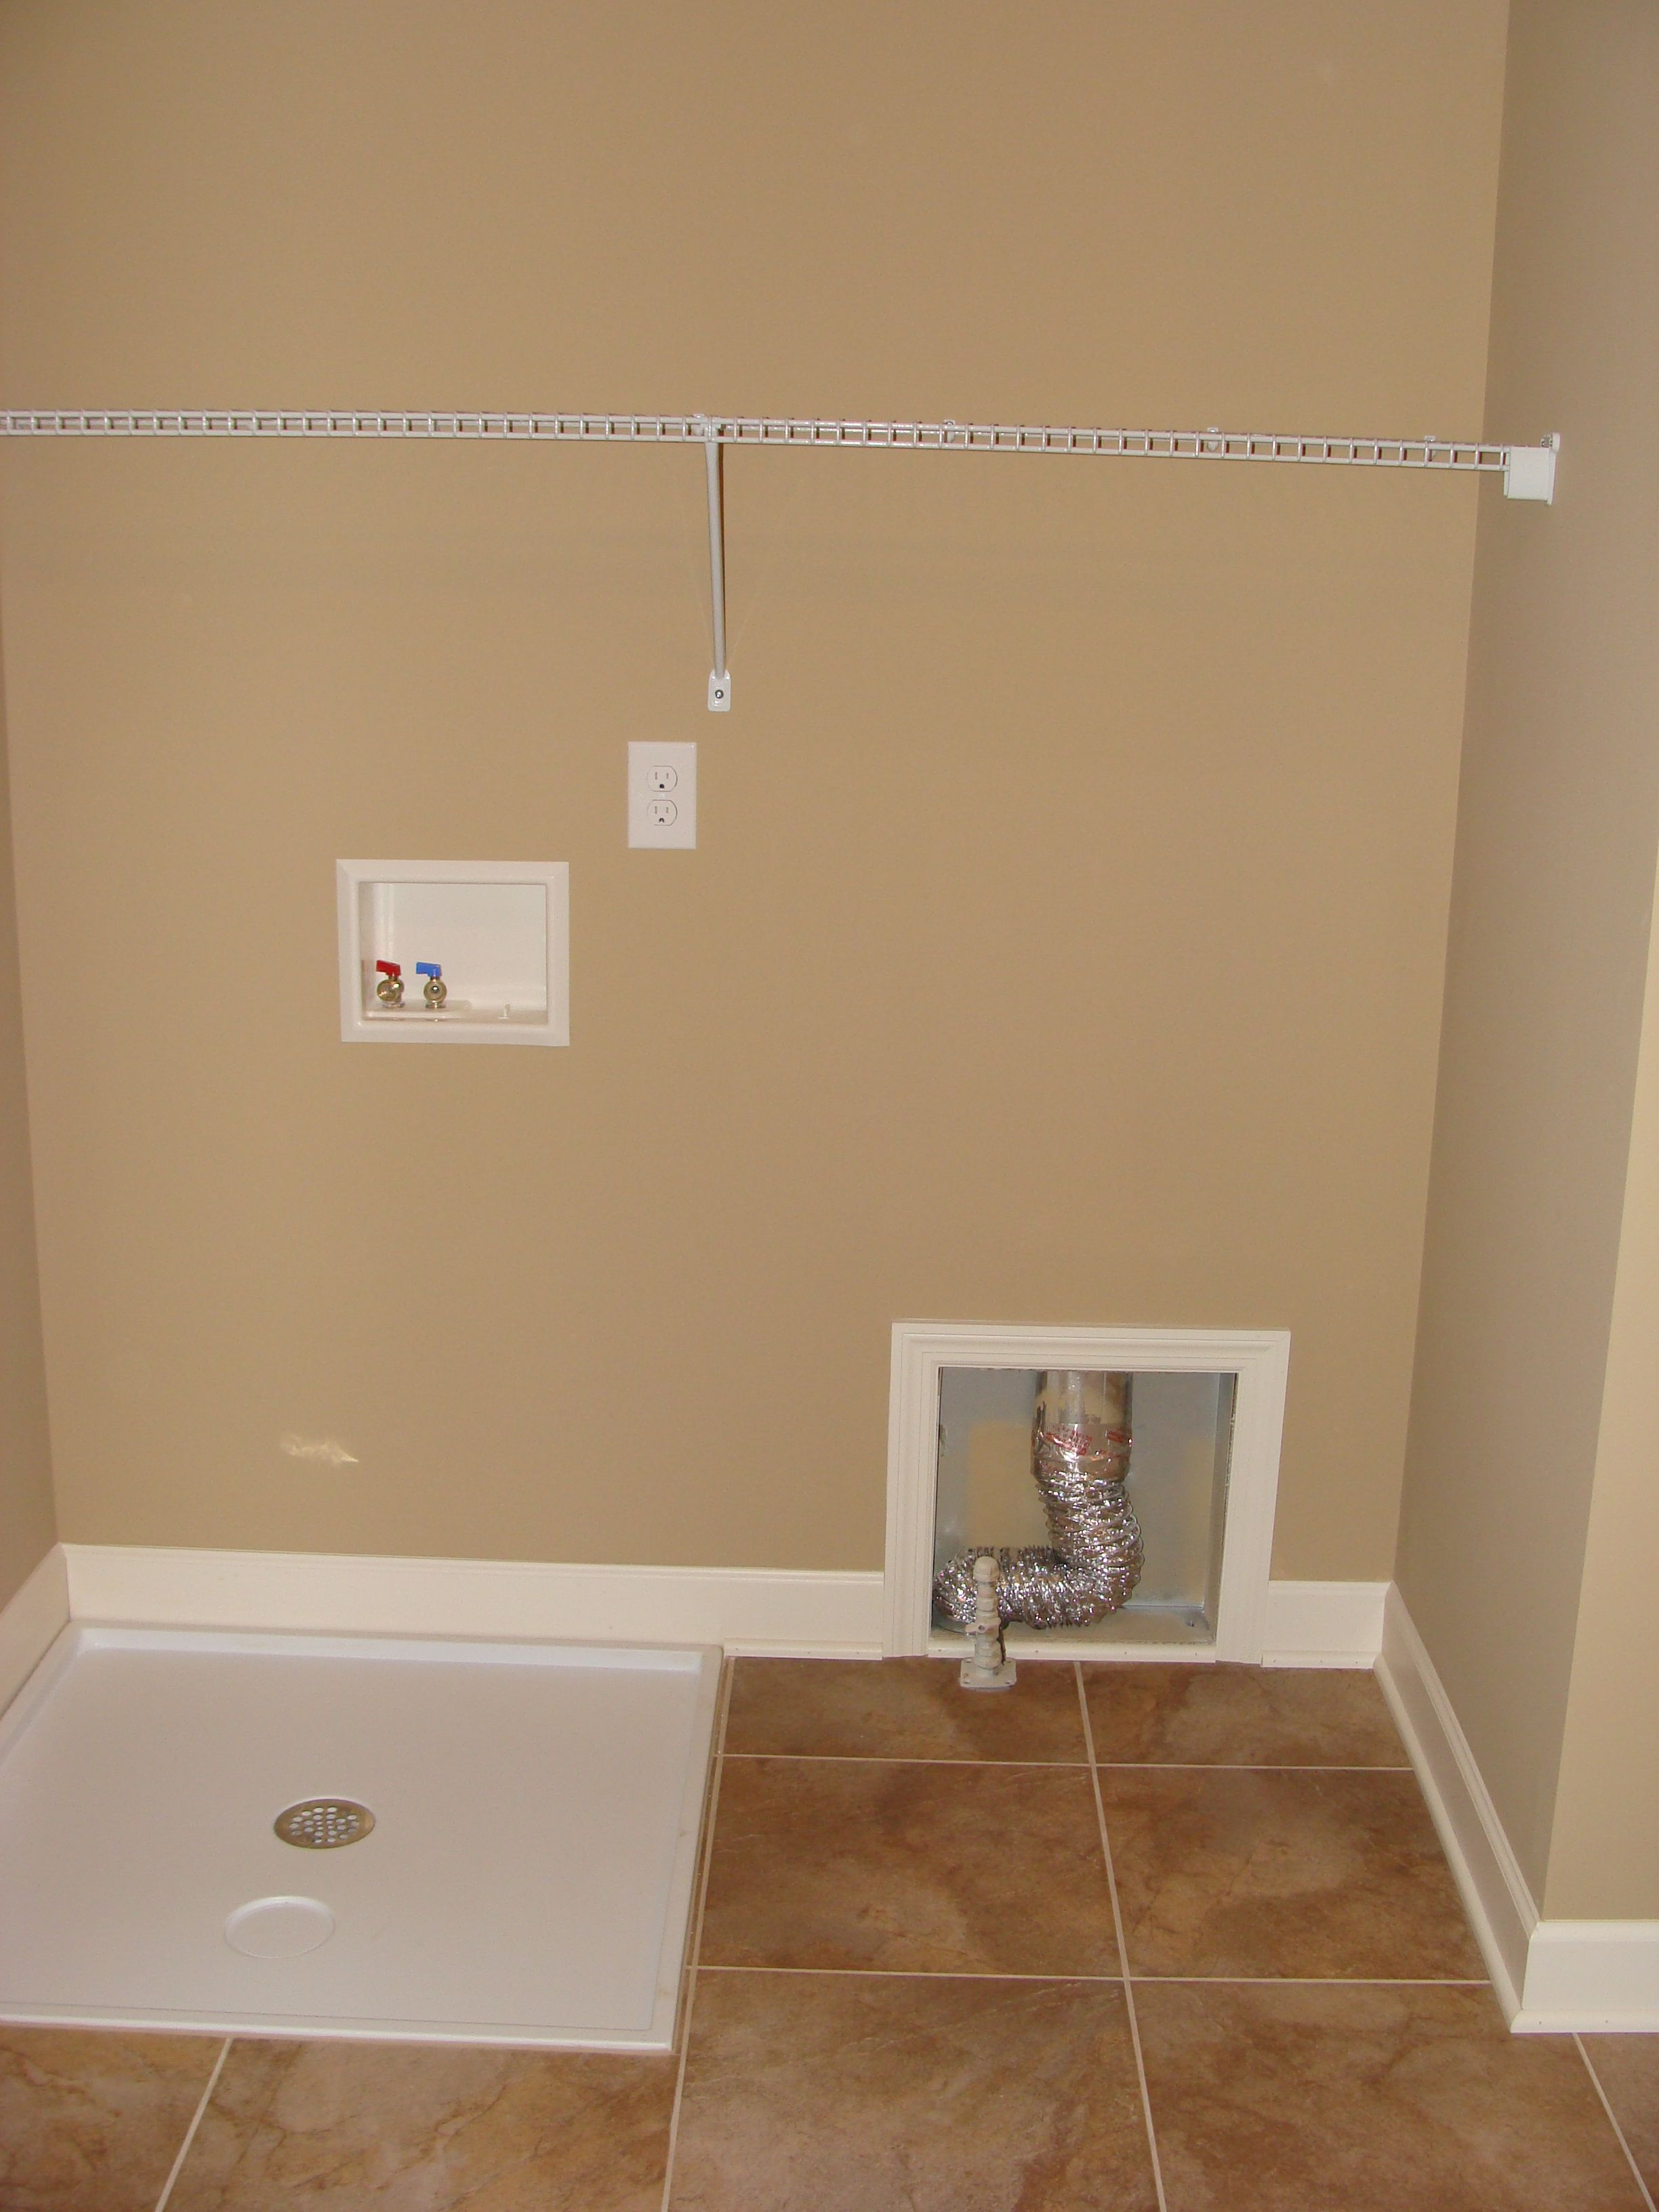 upstairs laundry room floor drain